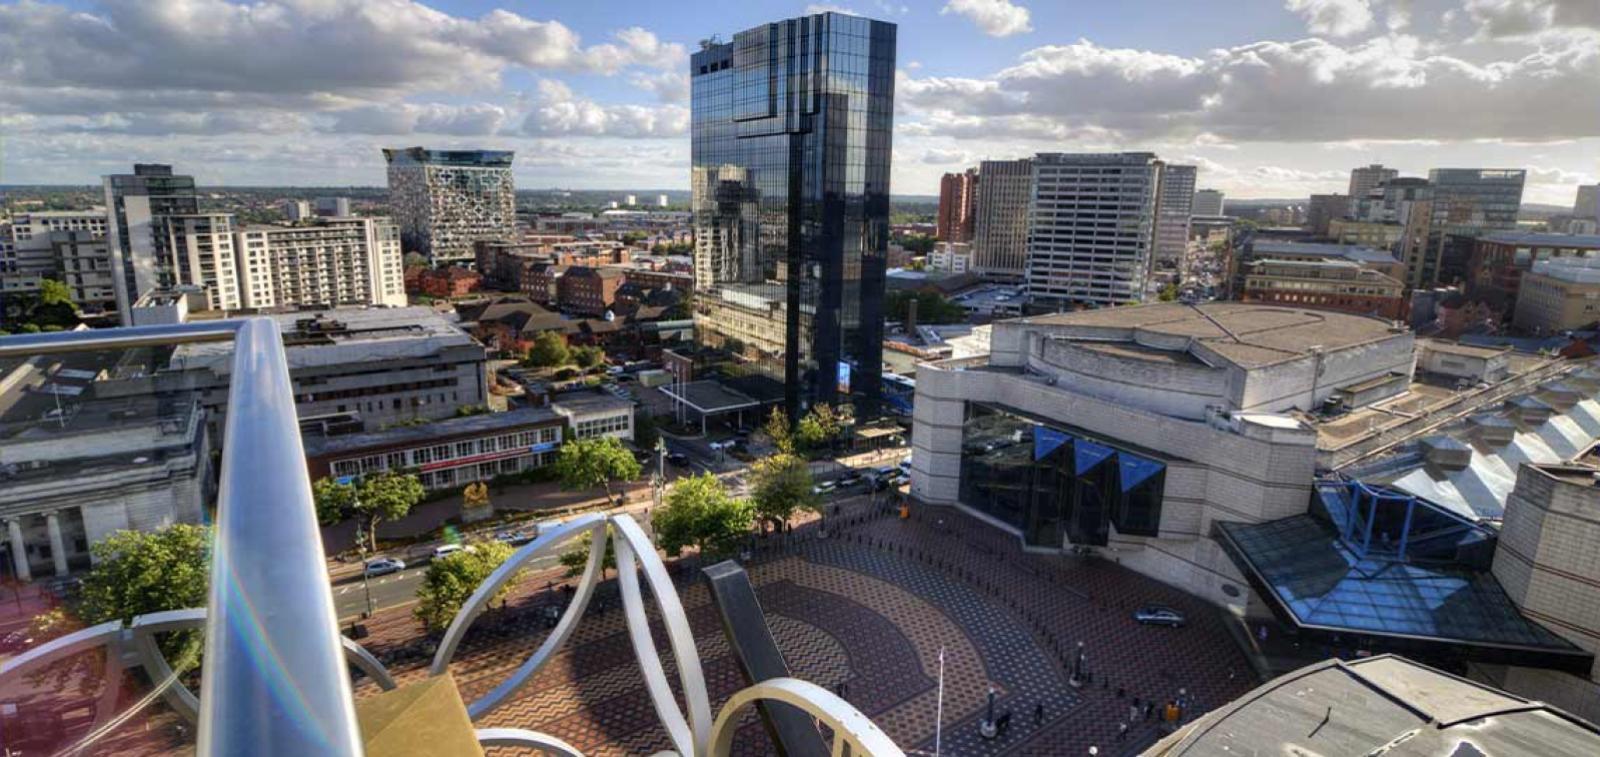 Aerial photograph of Birmingham city centre